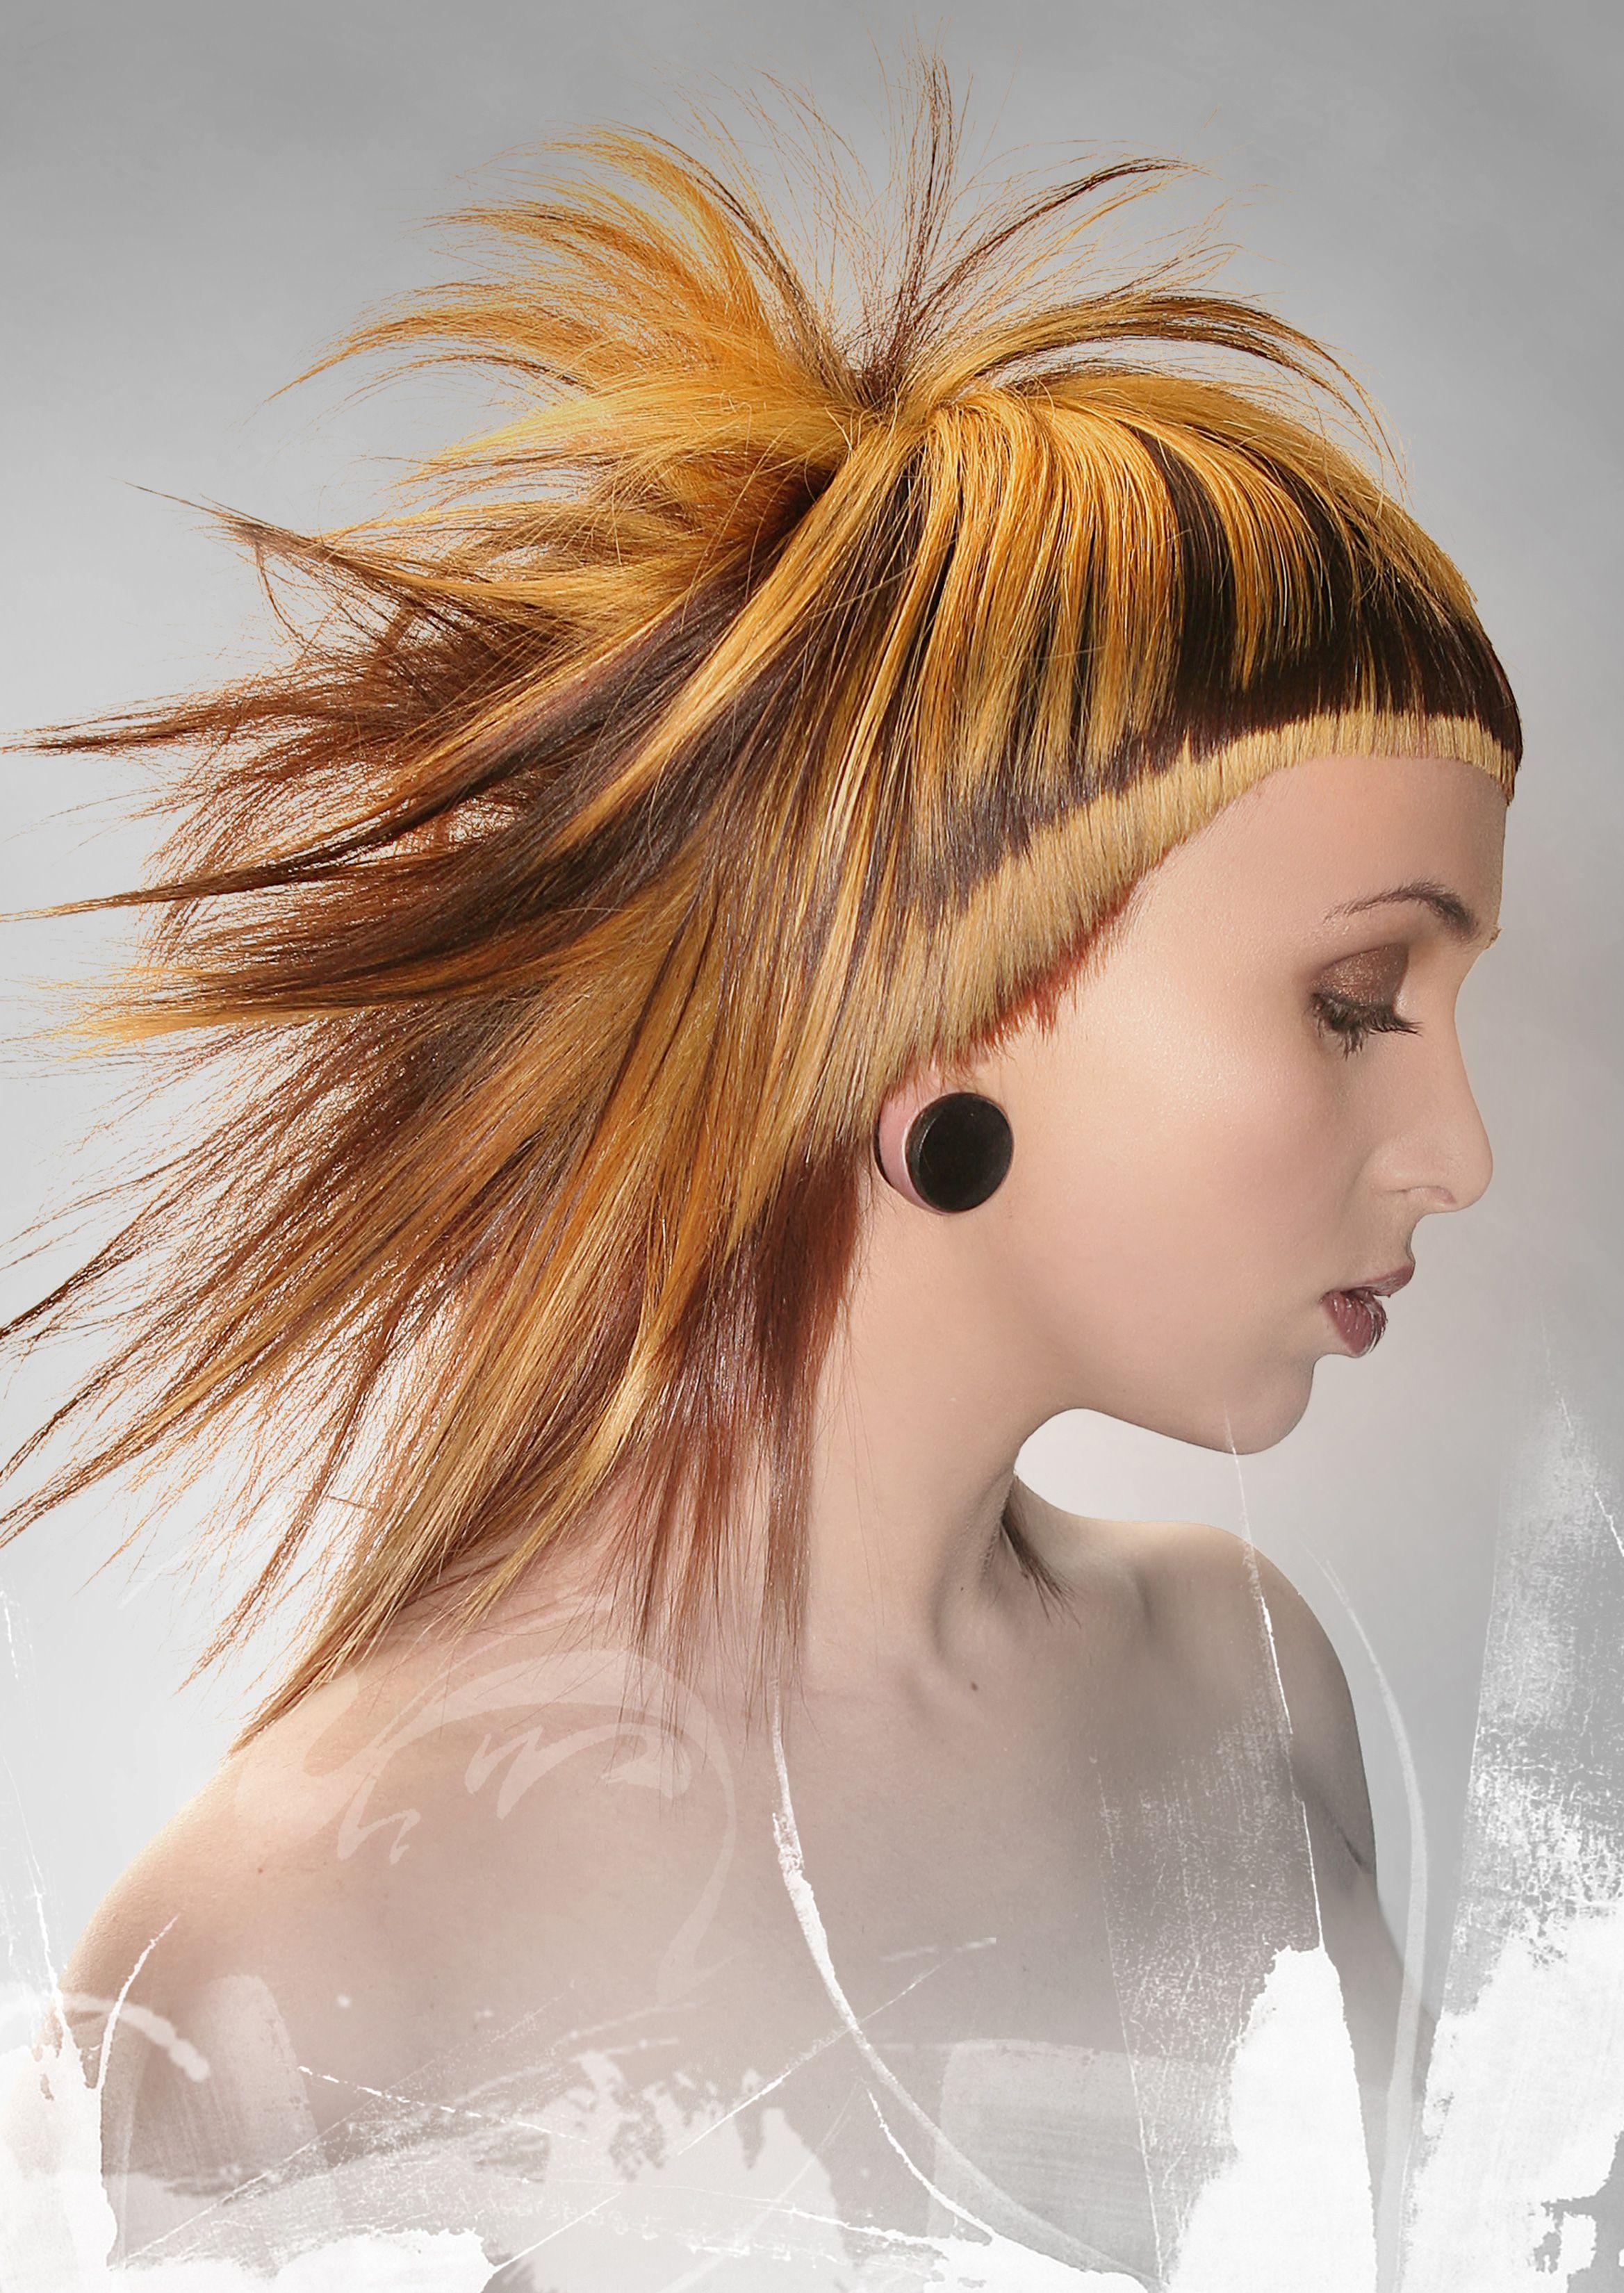 Jake thompson fashion hair pinterest hair coloring naha and